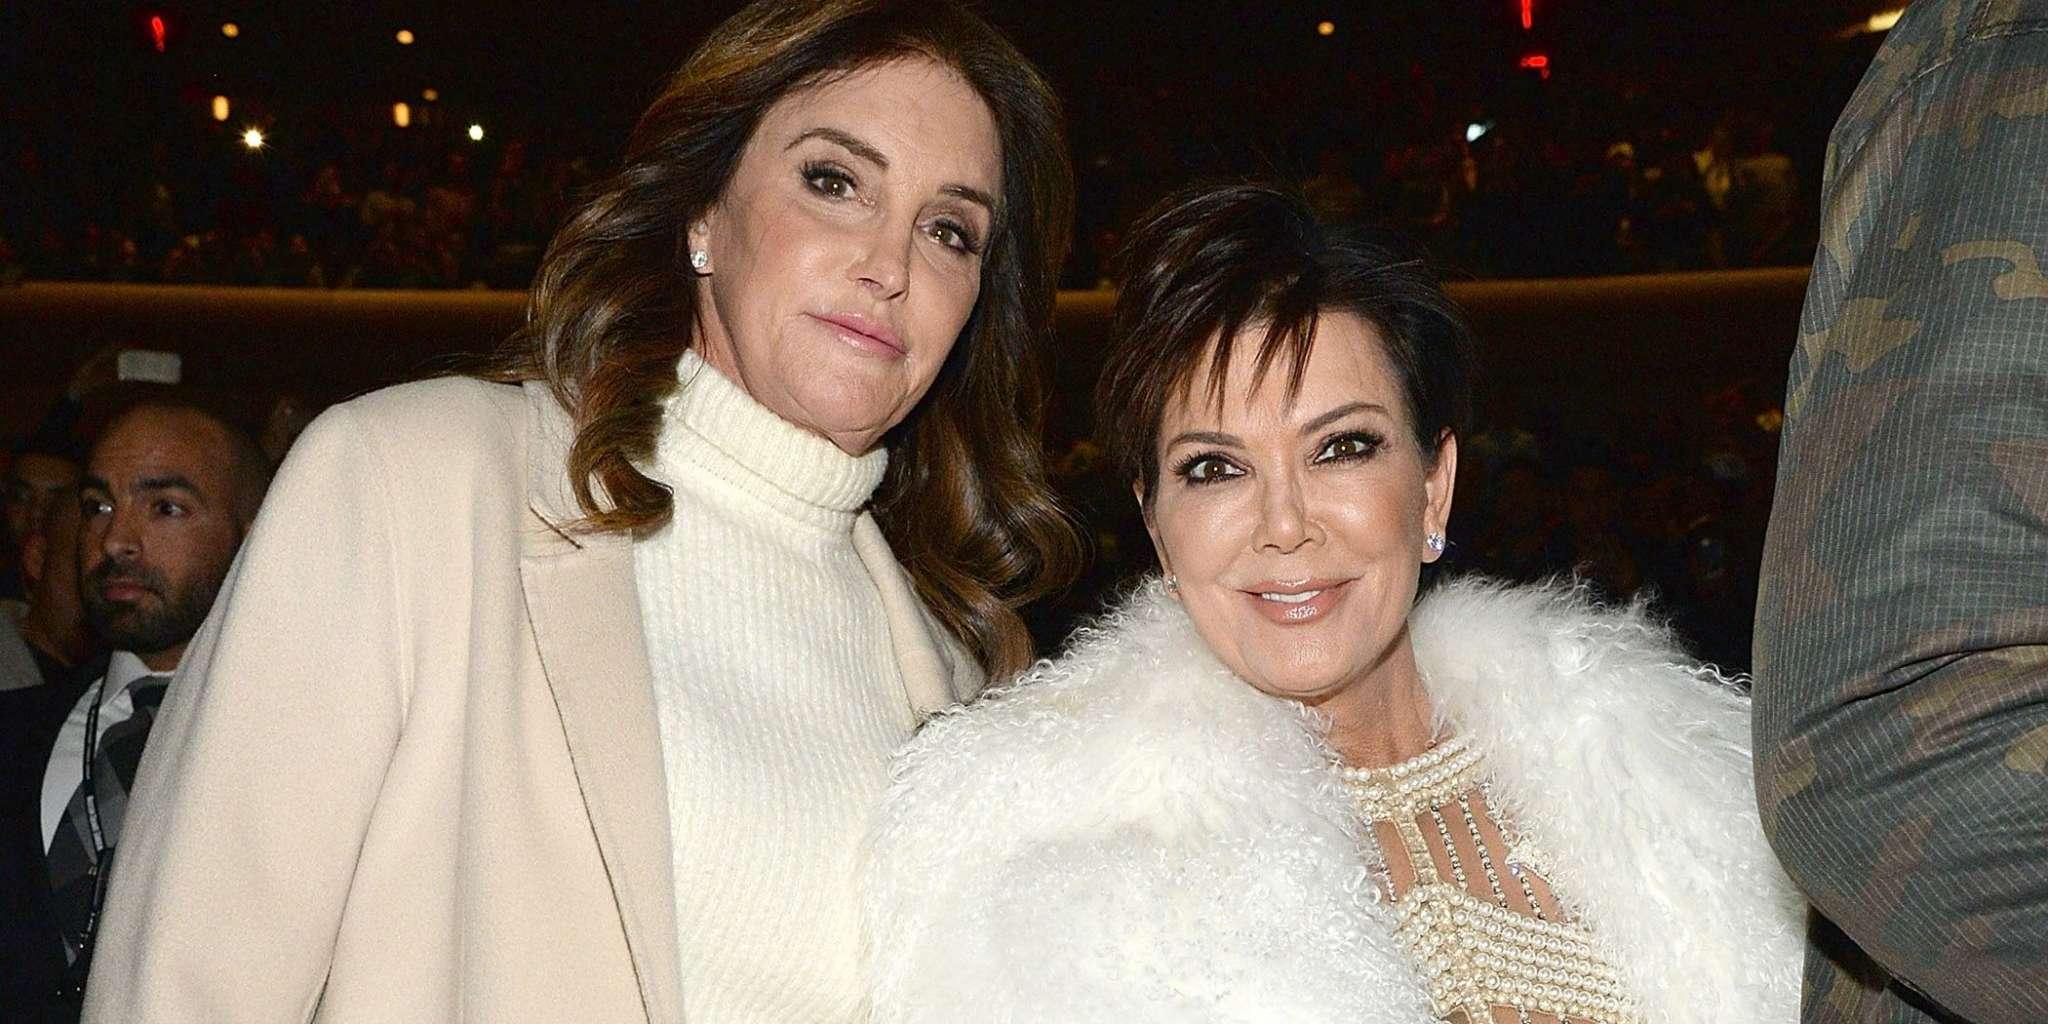 Kylie Jenner hospitalised, will miss Paris Fashion Week